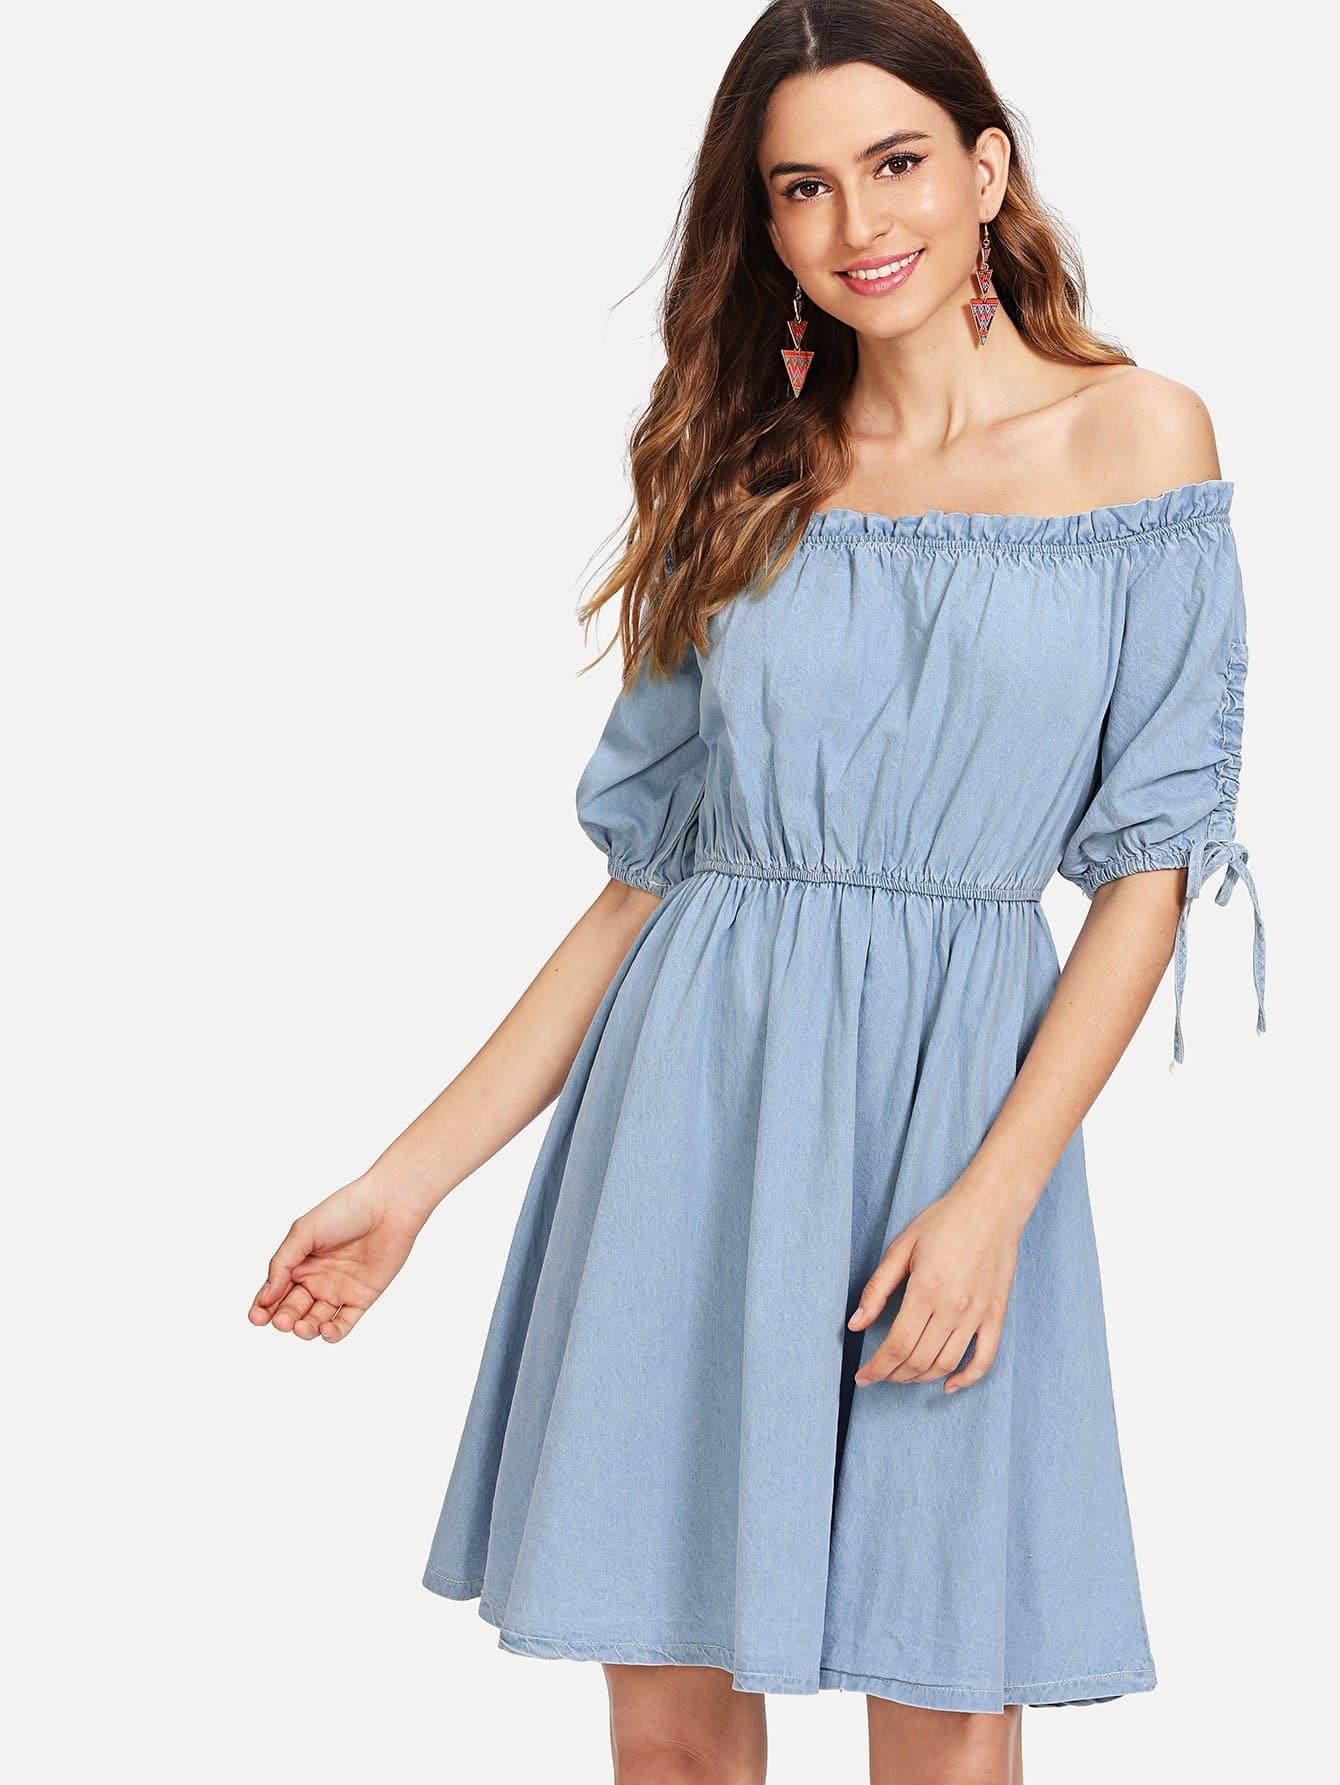 Off-Shoulder Elastic Waist Denim Dress elastic waist button denim dress